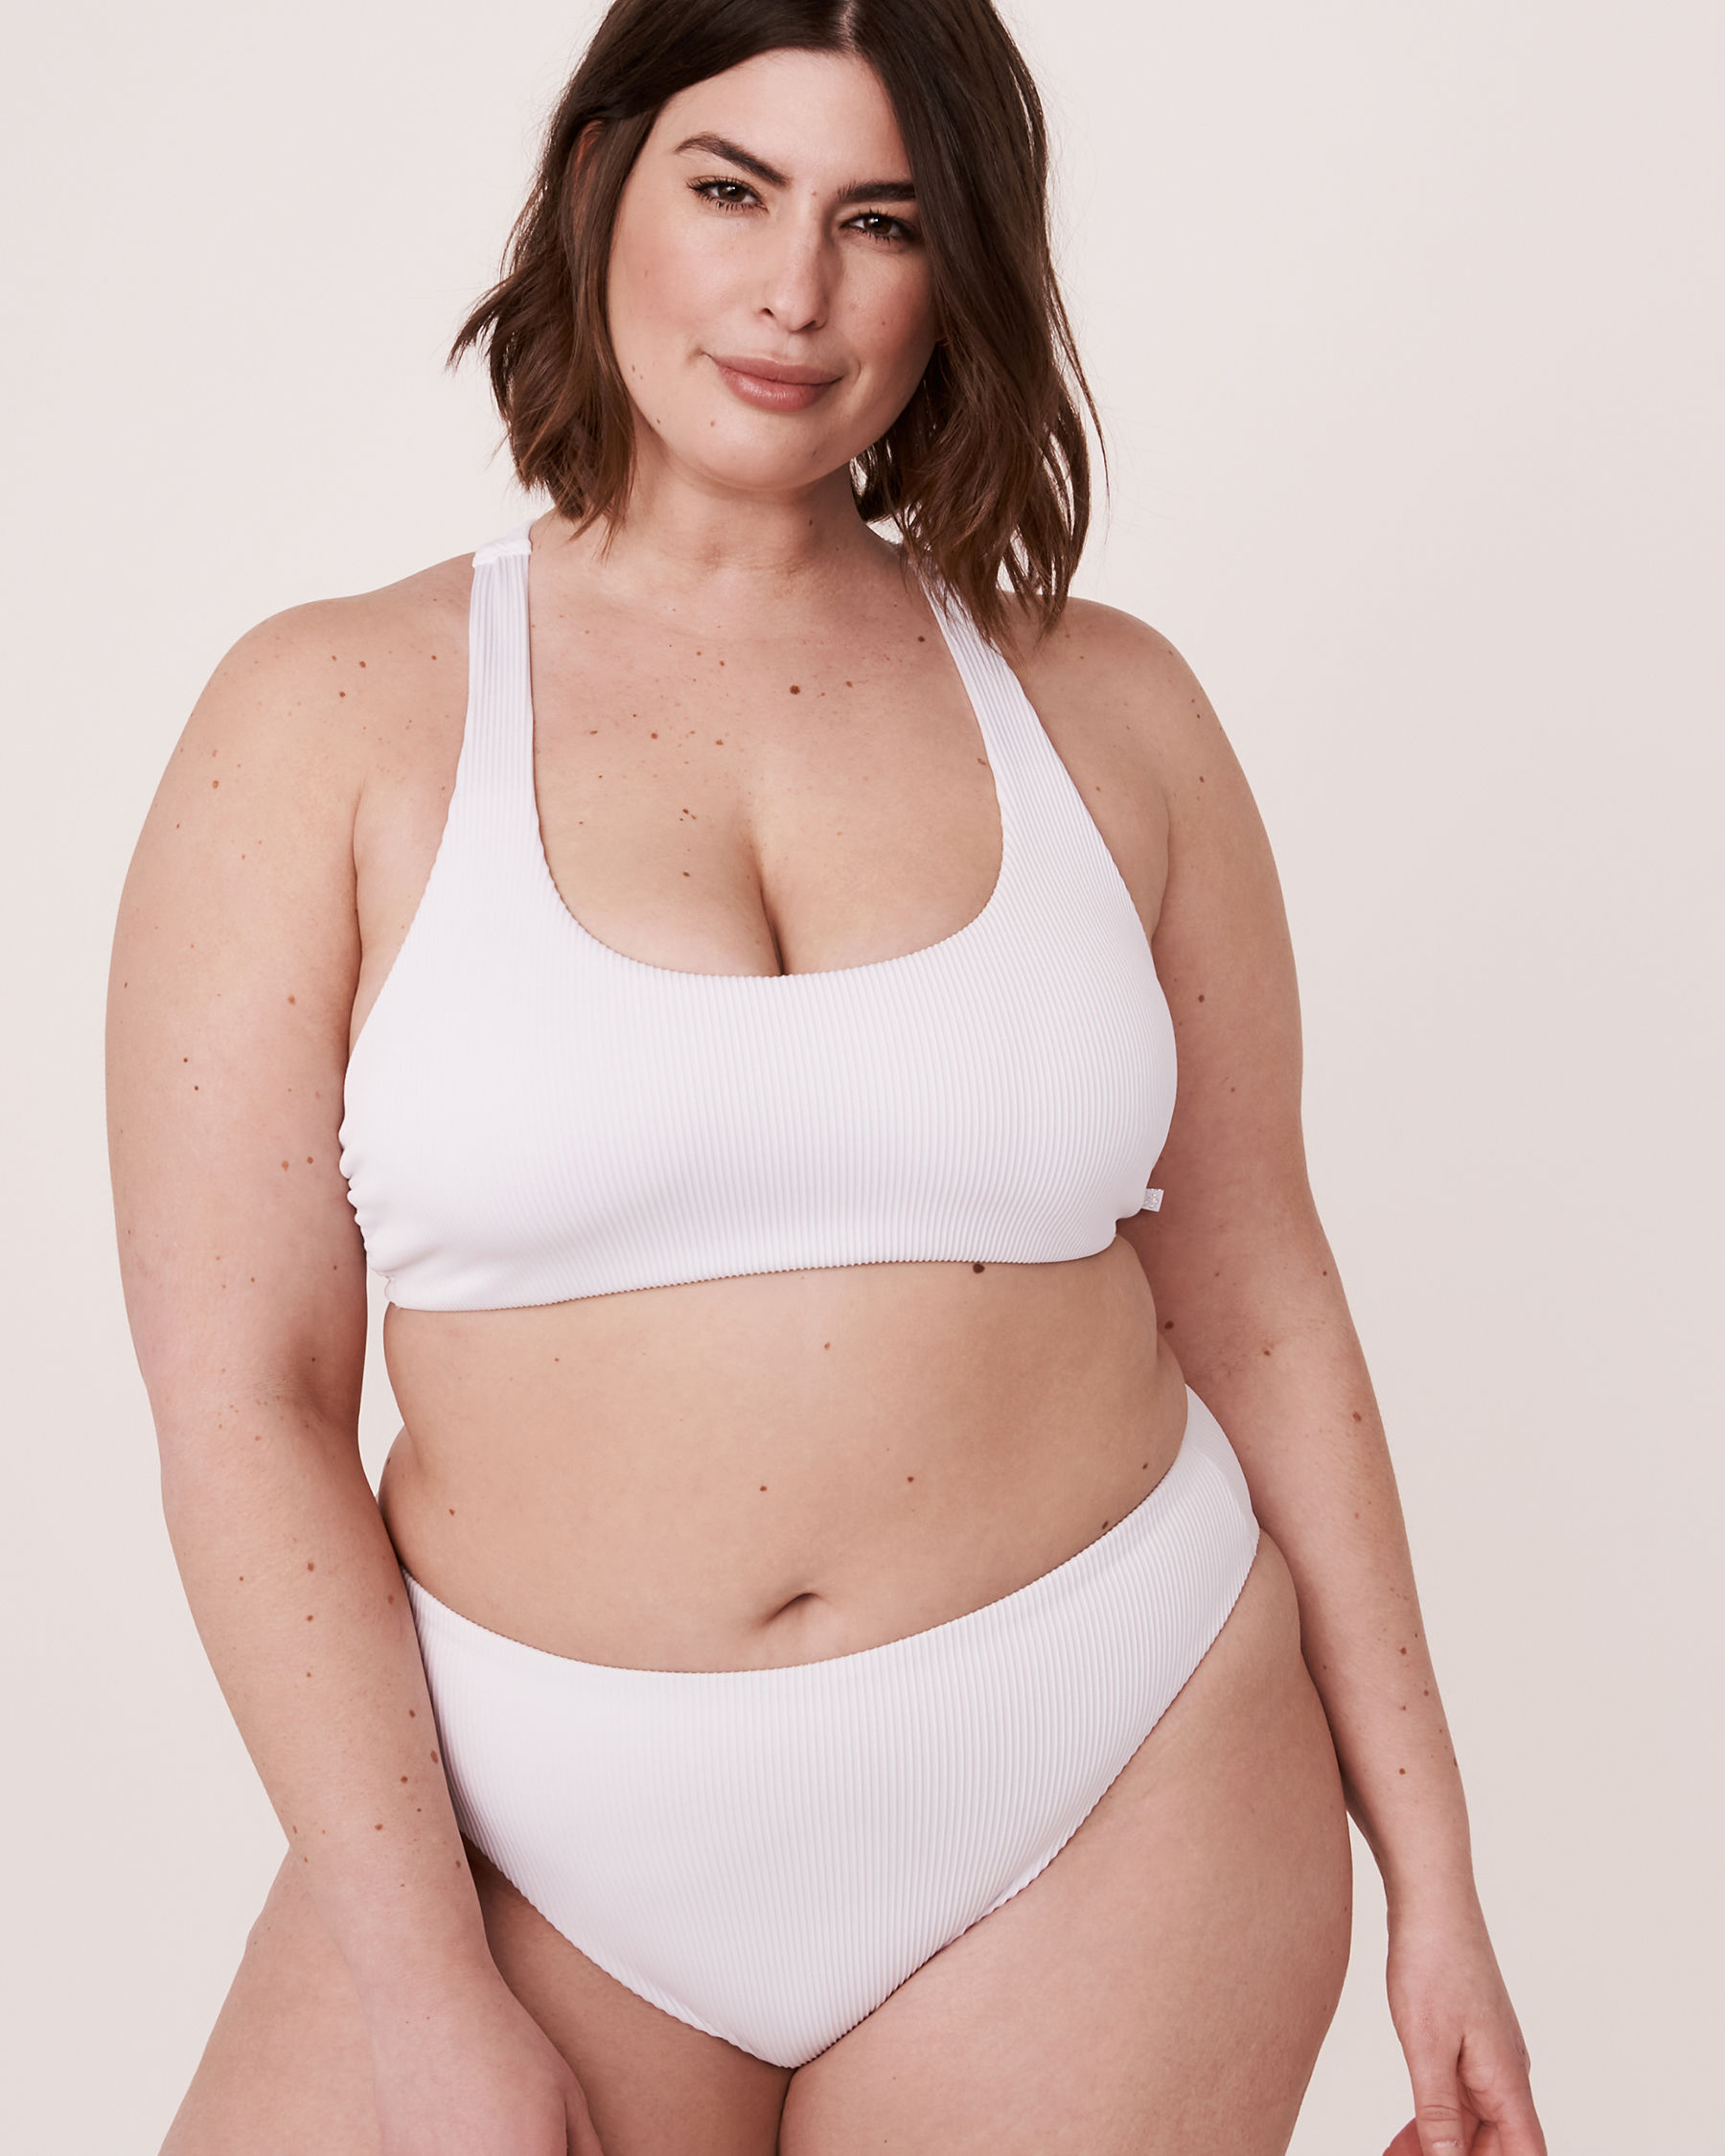 LA VIE EN ROSE AQUA Bas de bikini tanga taille haute en fibres recyclées WHITE RIB Blanc 70300083 - Voir6